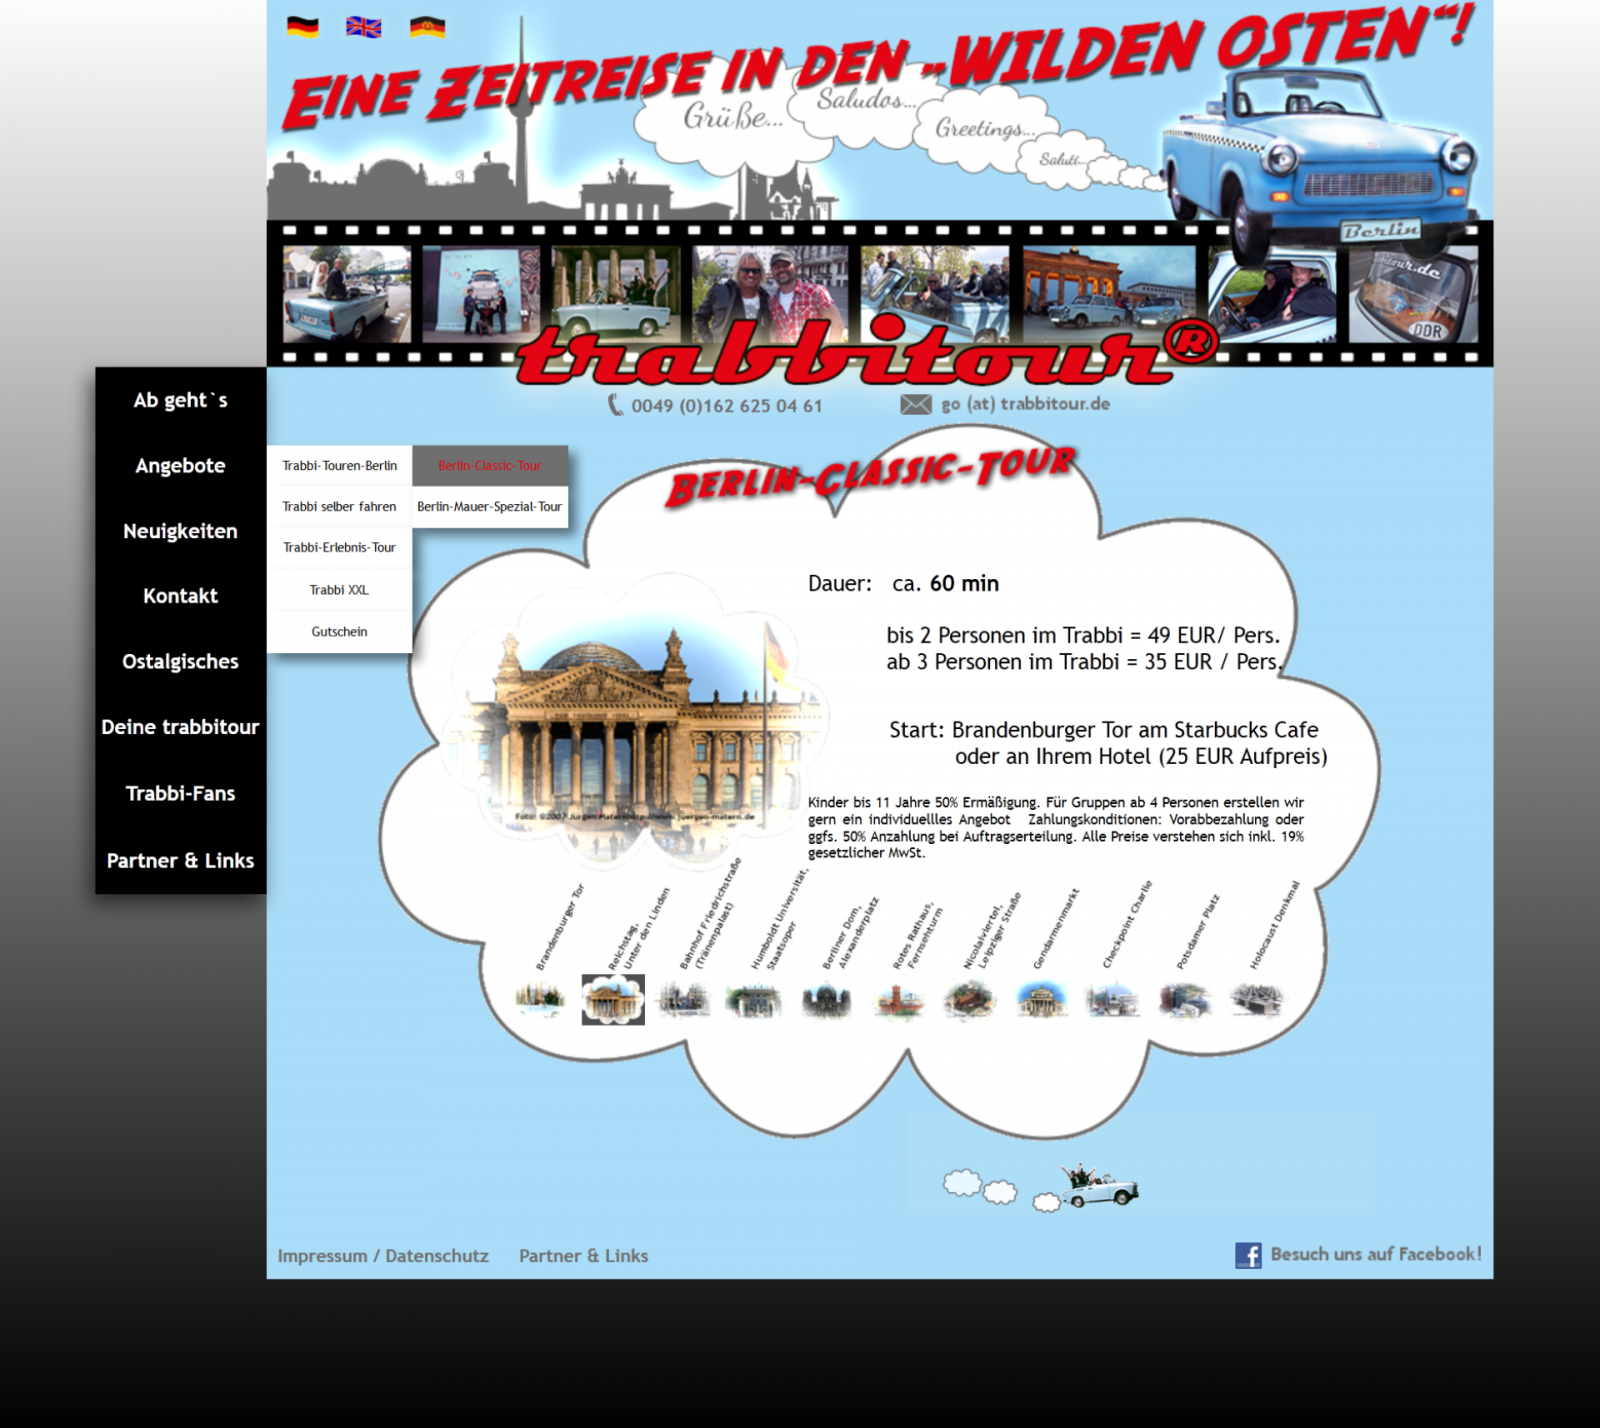 trabbitour-screenshot_berlin-classic-tour